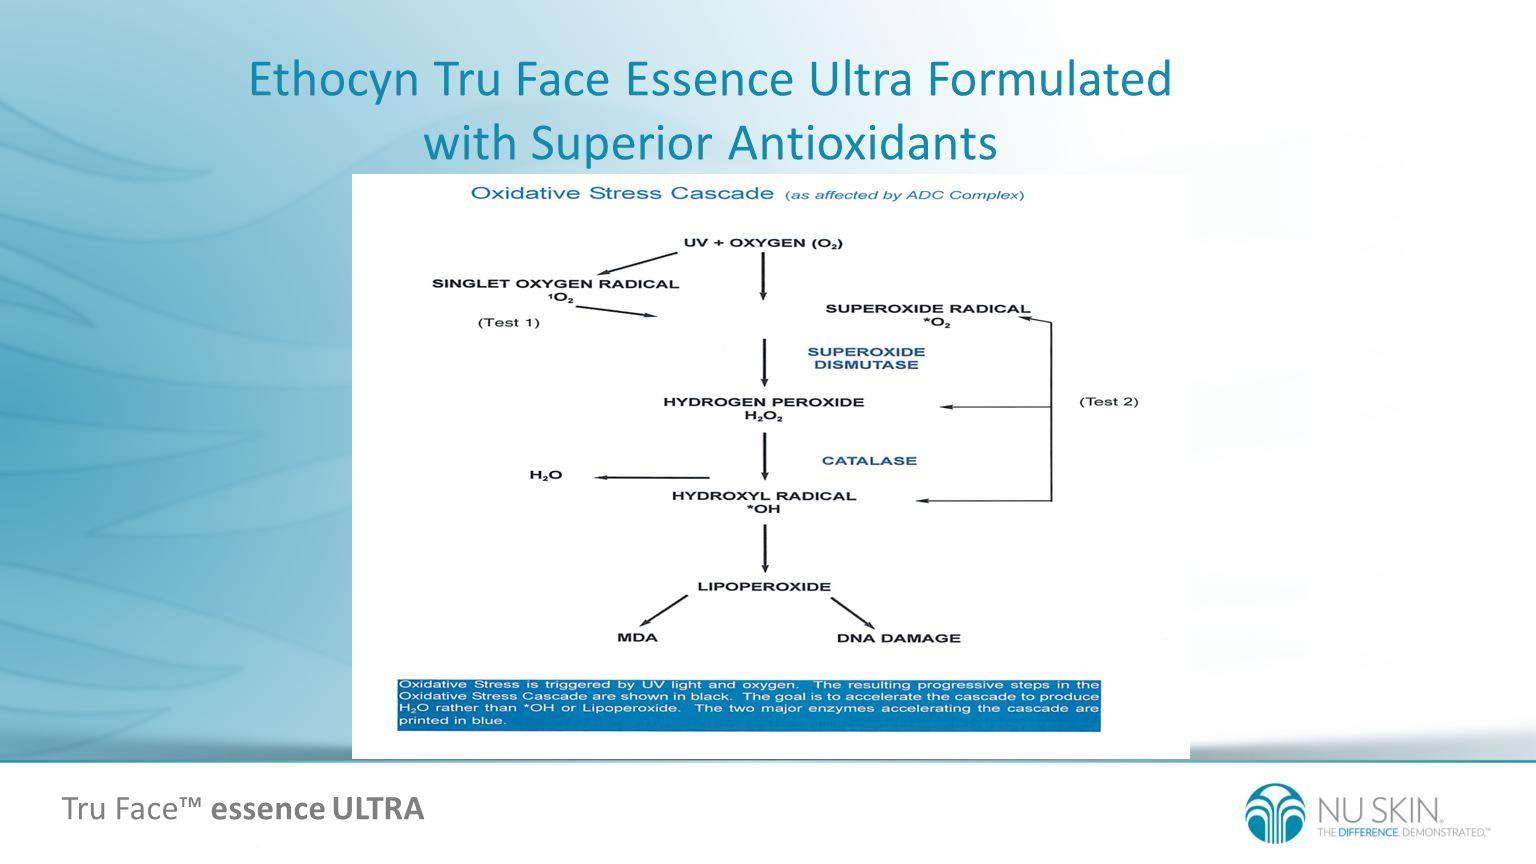 Ethocyn Tru Face Essence Ultra Formulated with Superior Antioxidants Tru Face essence ULTRA